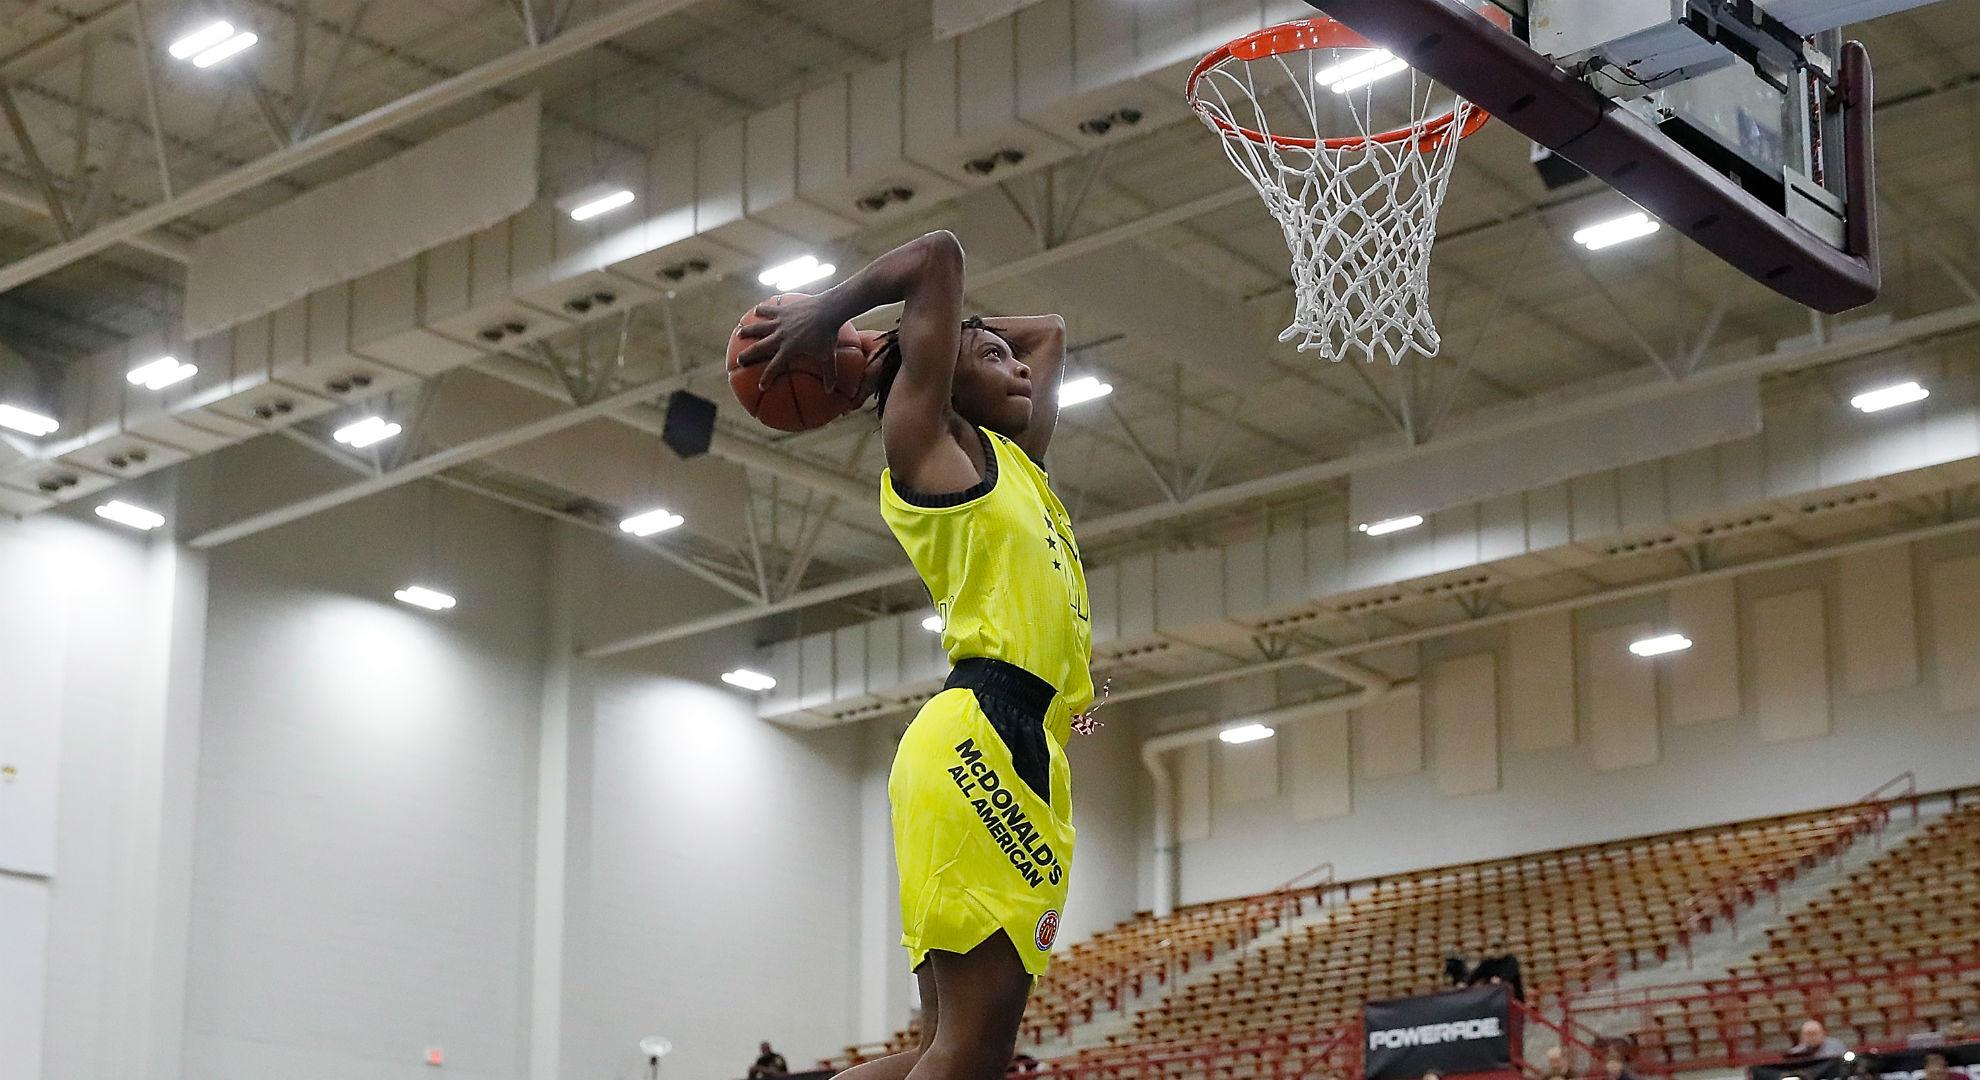 Darius Garland withdraws from Vanderbilt to prepare for 2019